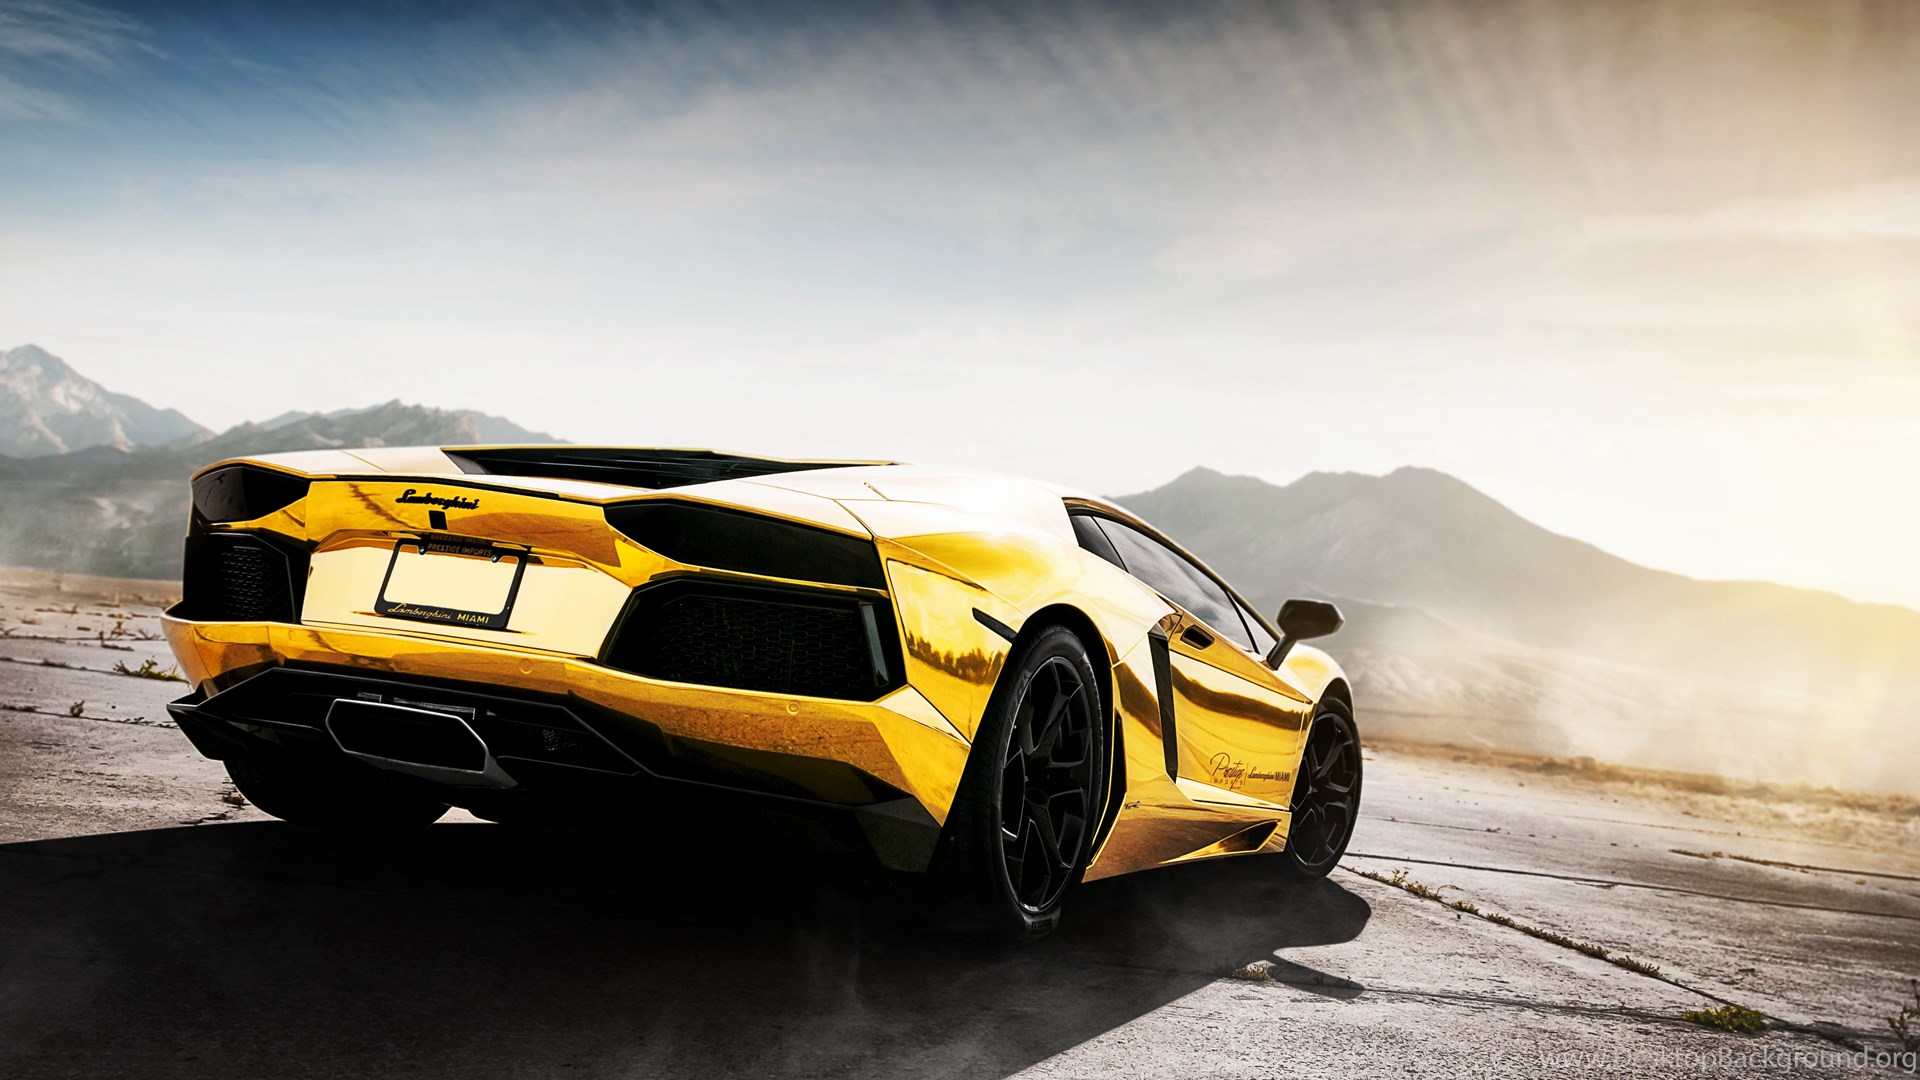 Lamborghini Reventon Wallpapers HD Wallpapper Desktop Background